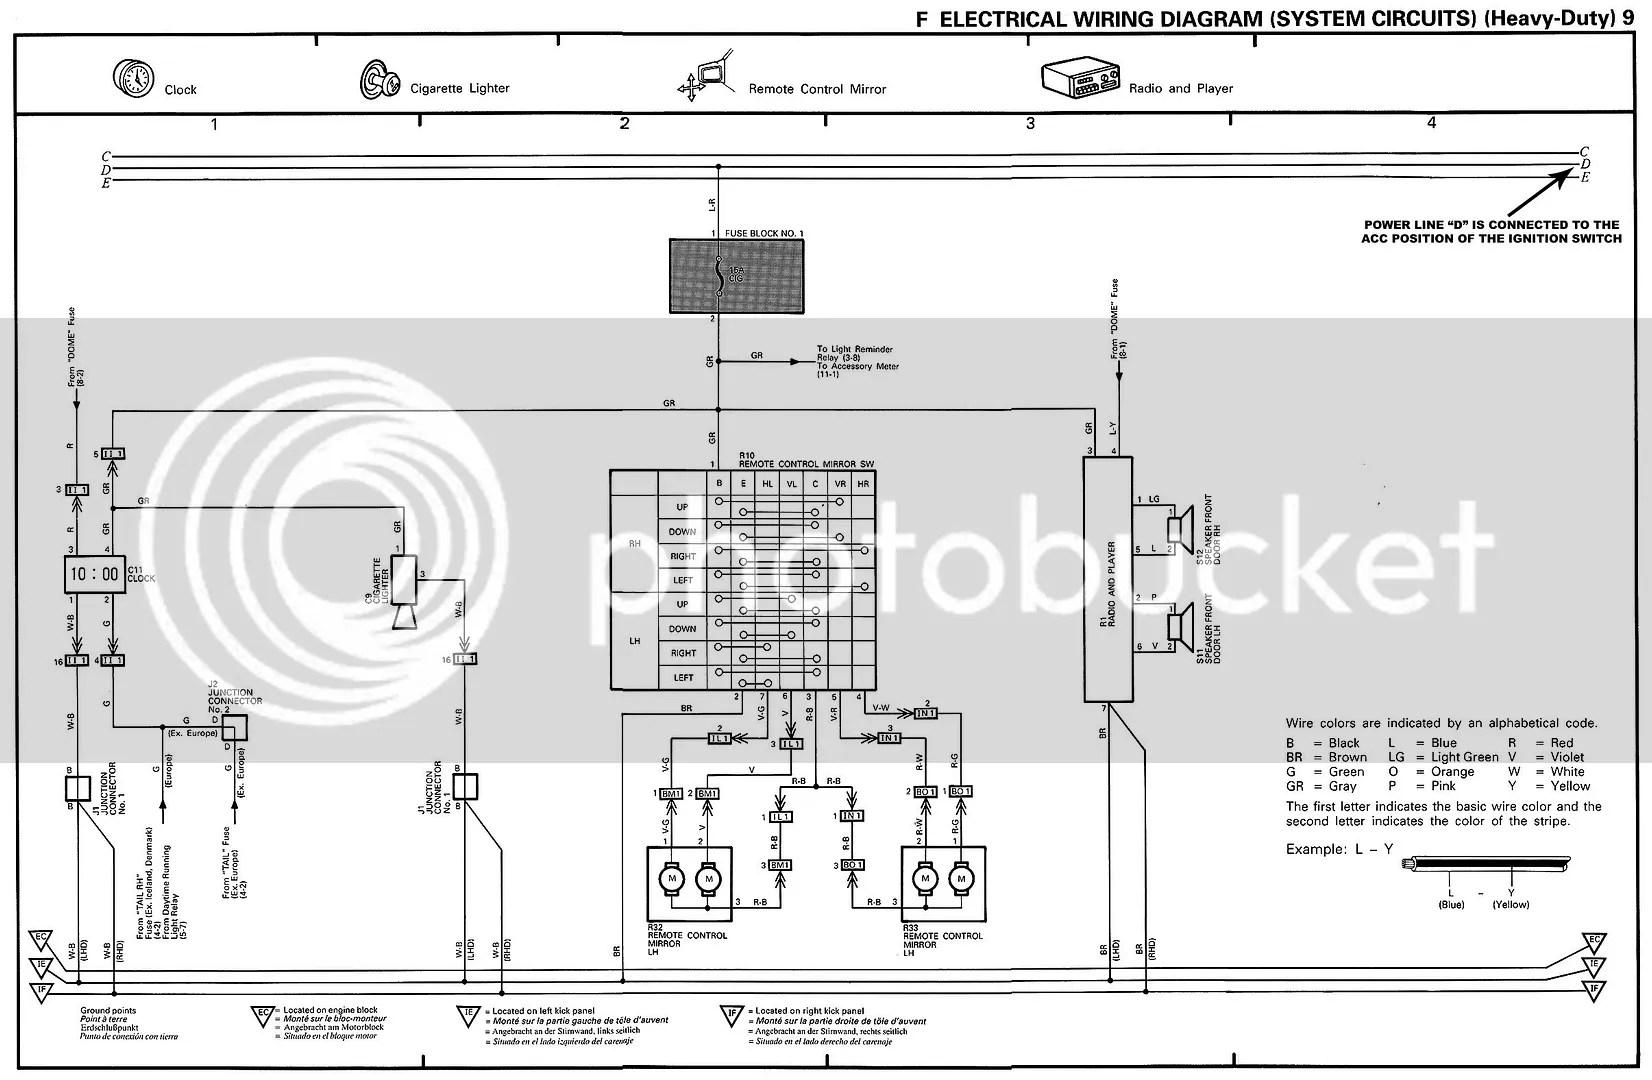 Toyota 70 Series Repair Manual by Simon | Photobucket